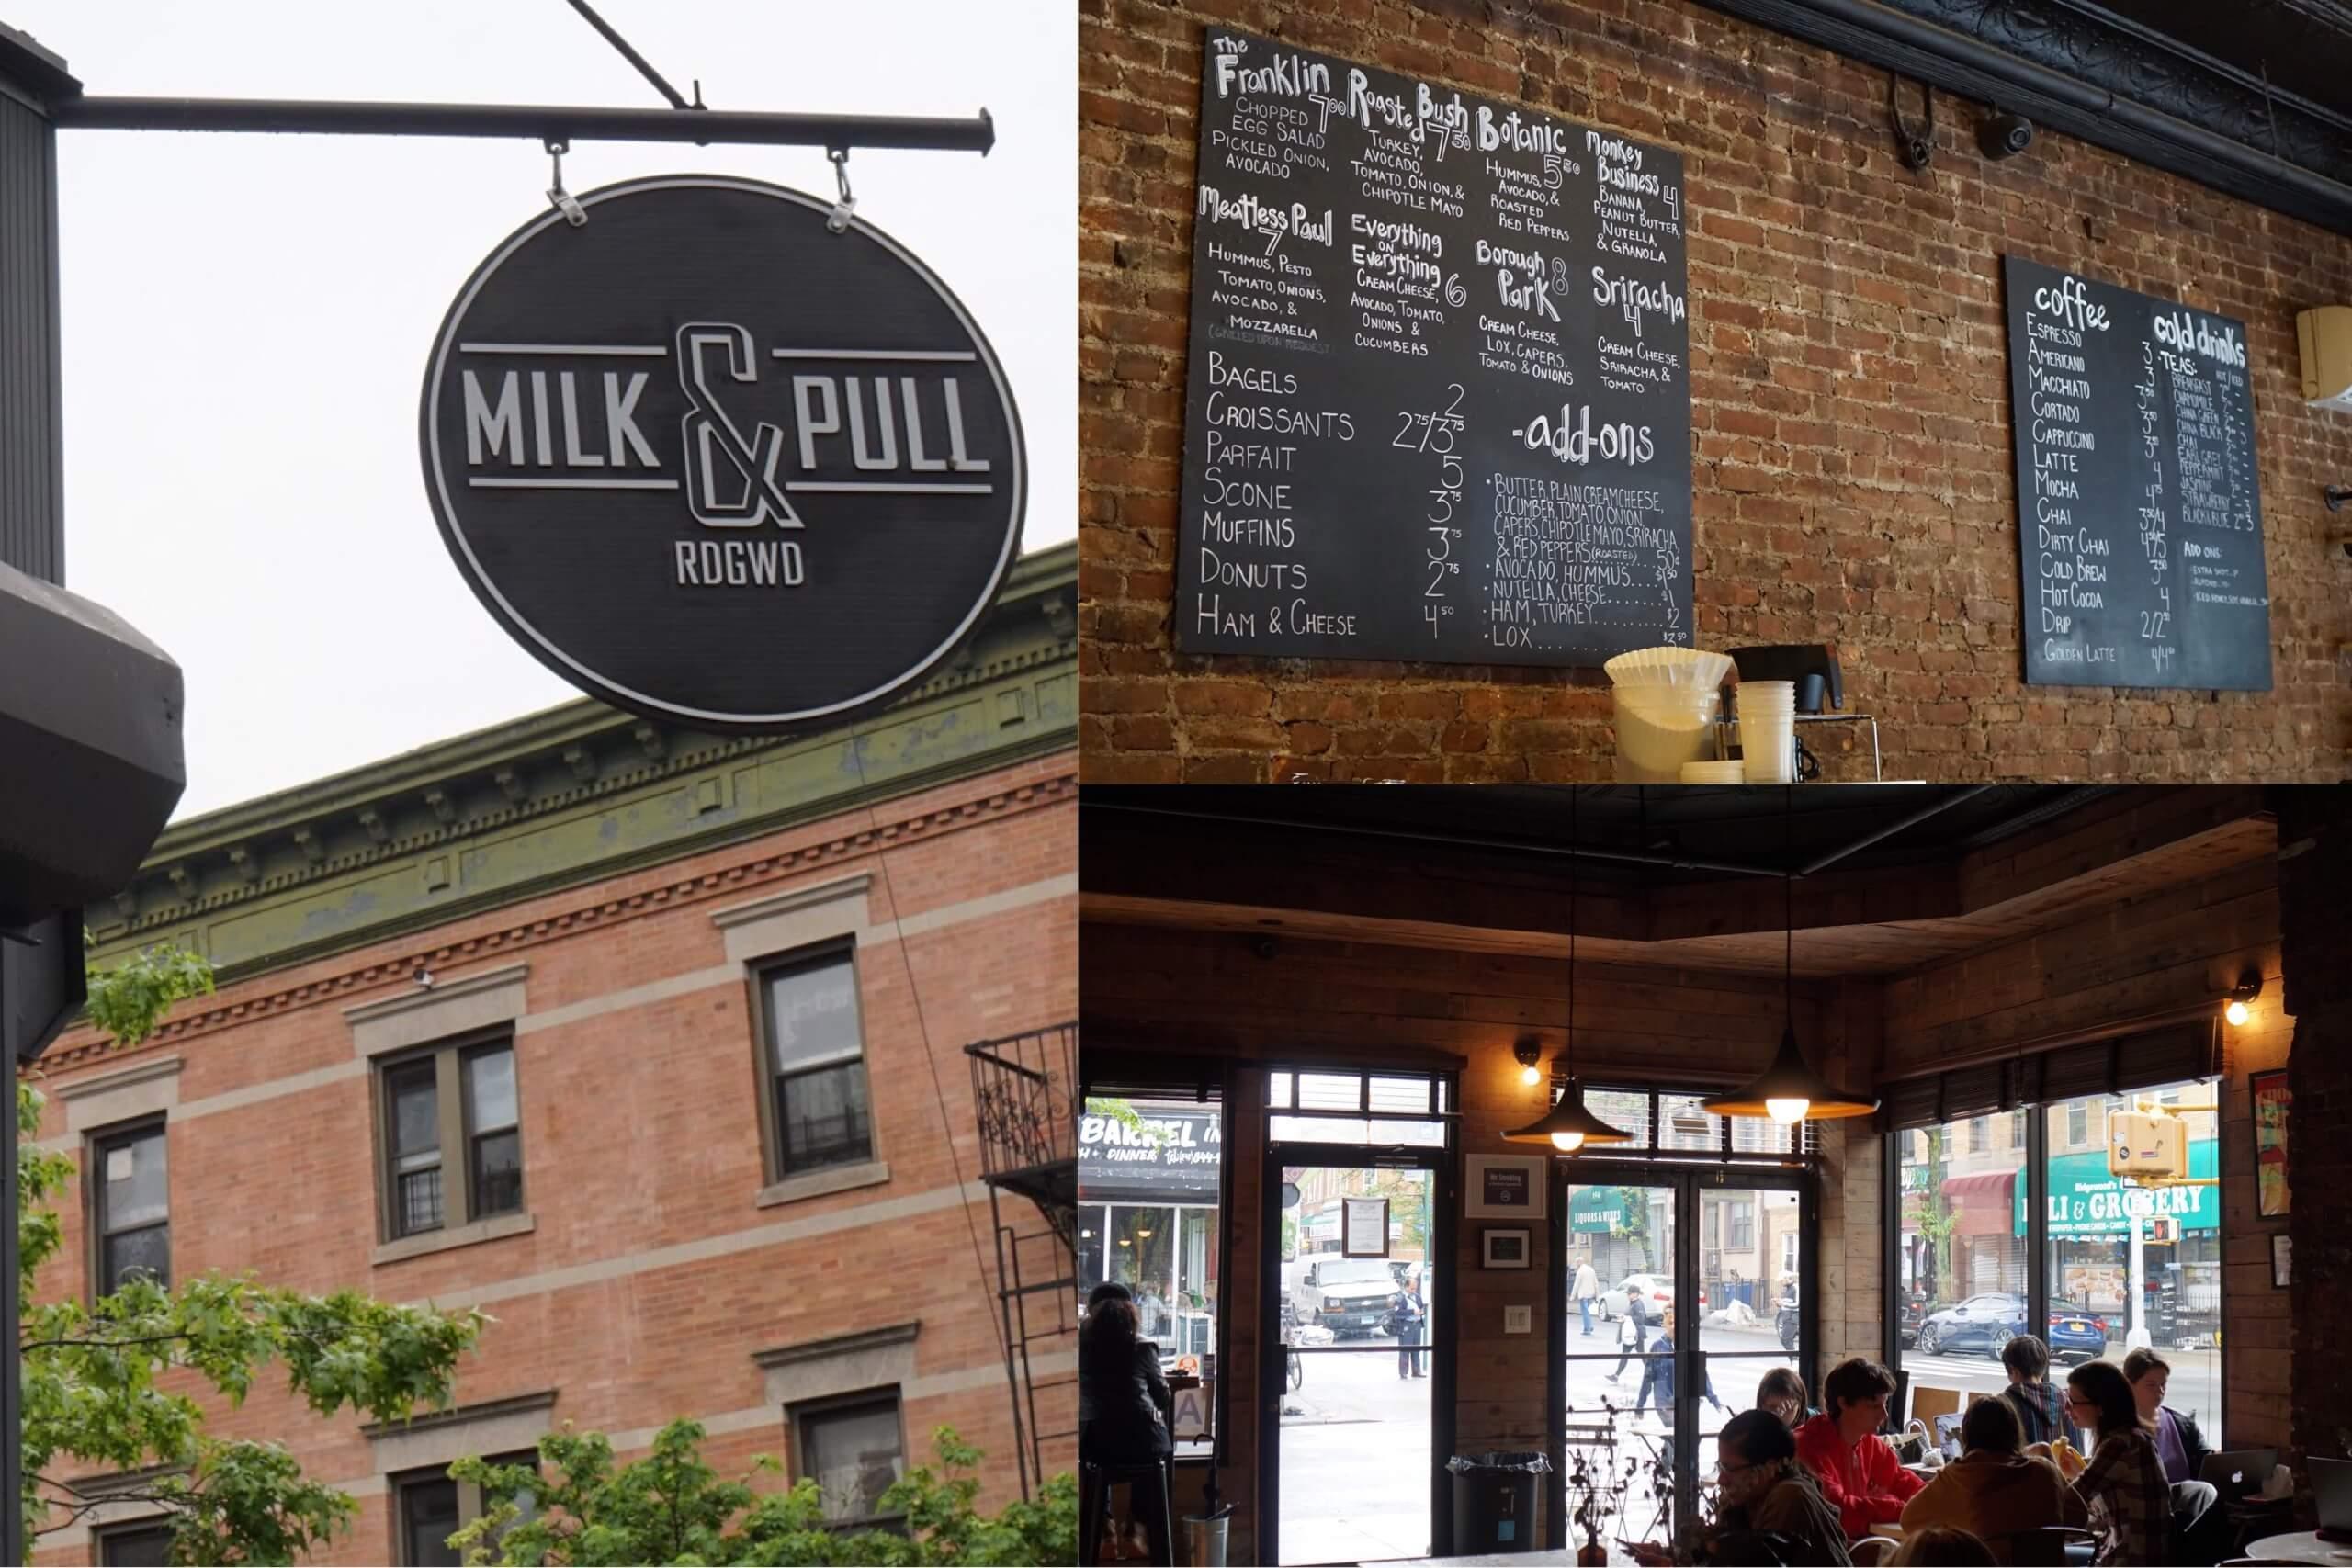 milk & pull ridgewood